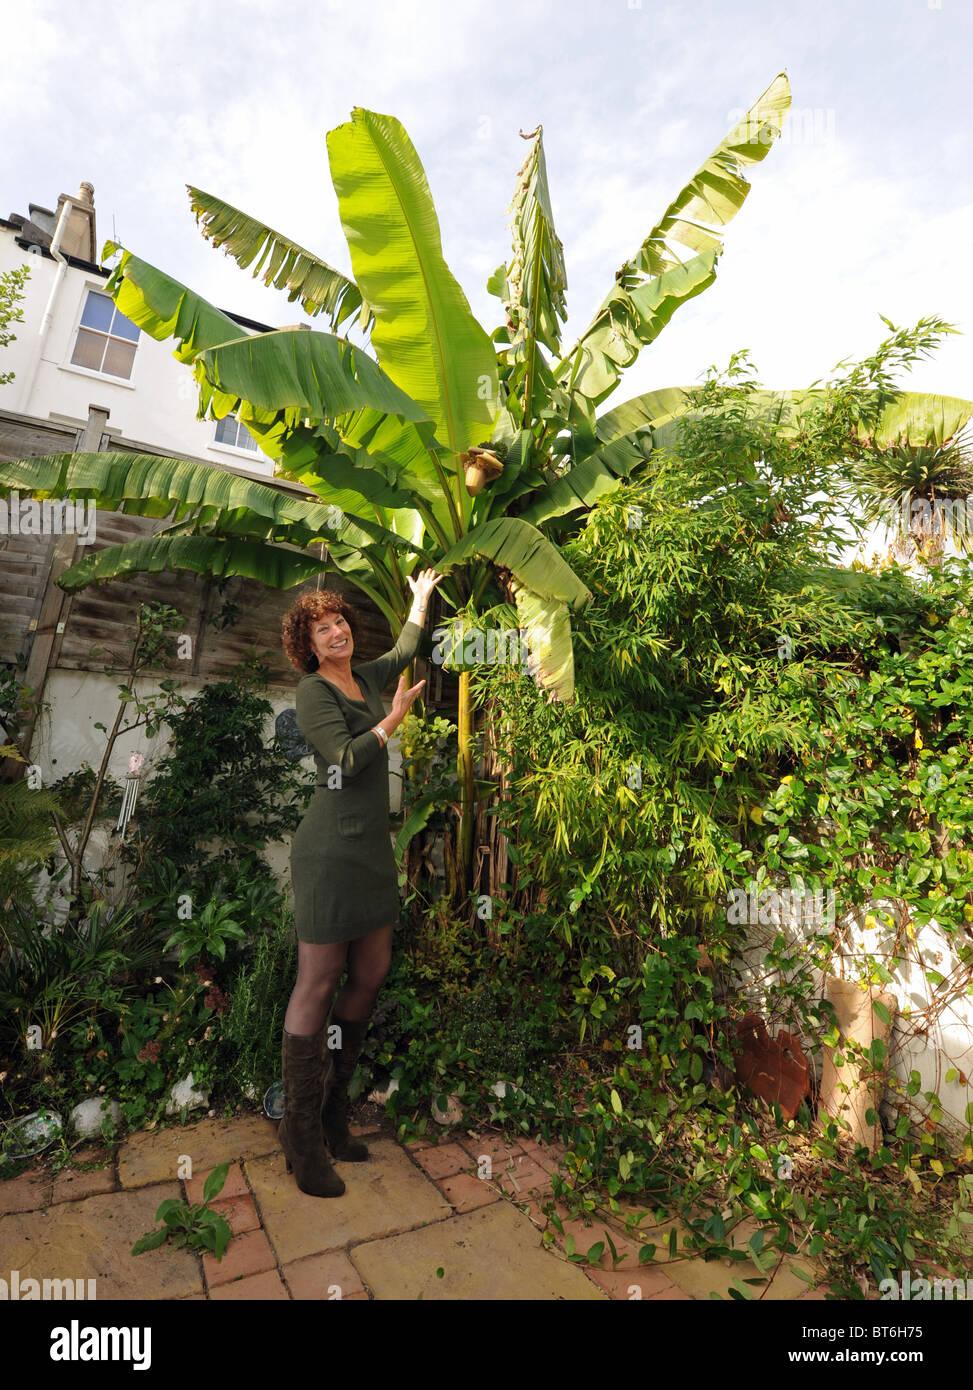 Hilary Masters With Her Musa Basjoo Tree Or Banana Tree At